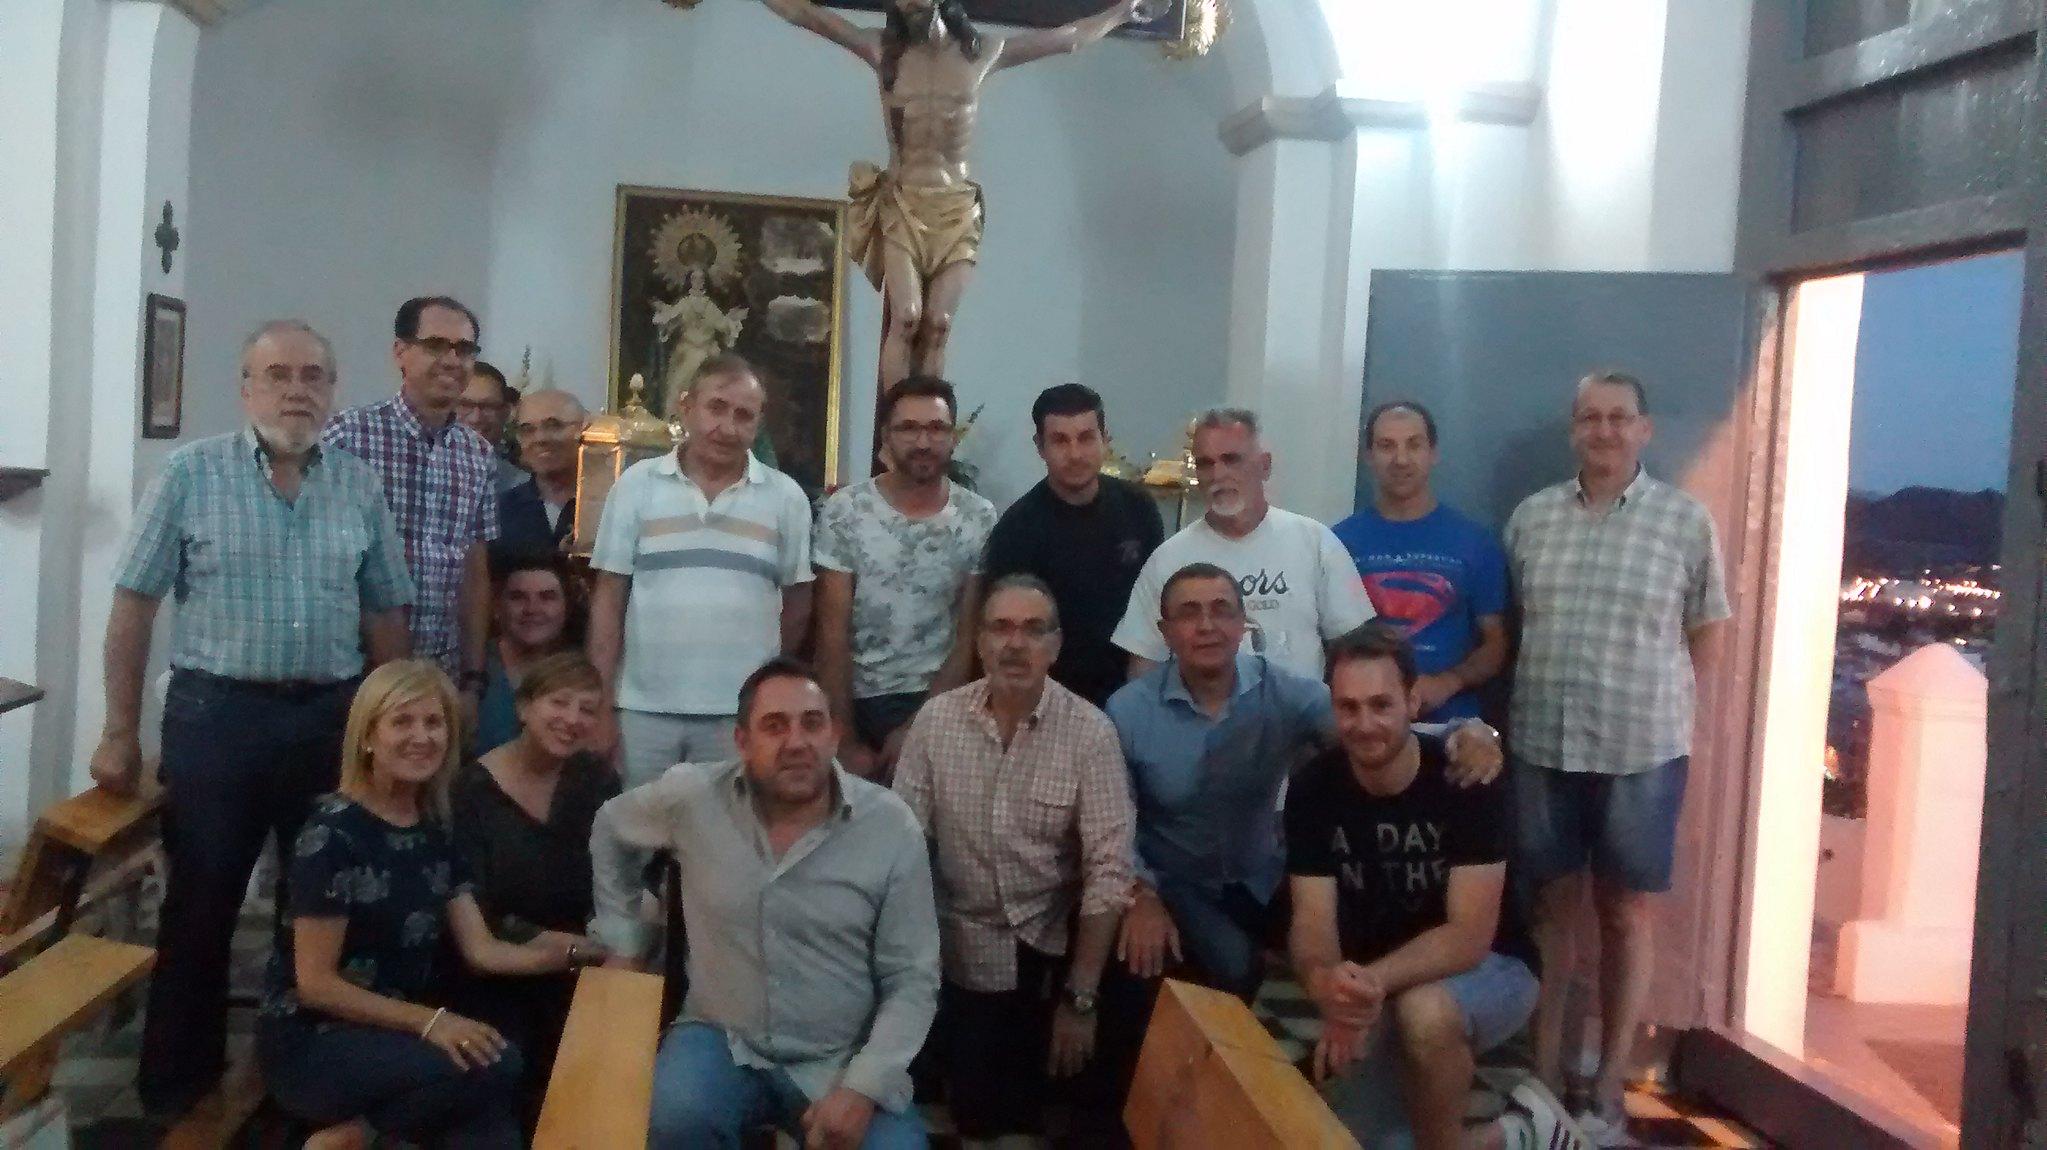 (2016-06-20) - Preparativos Imagen - Ana (02)